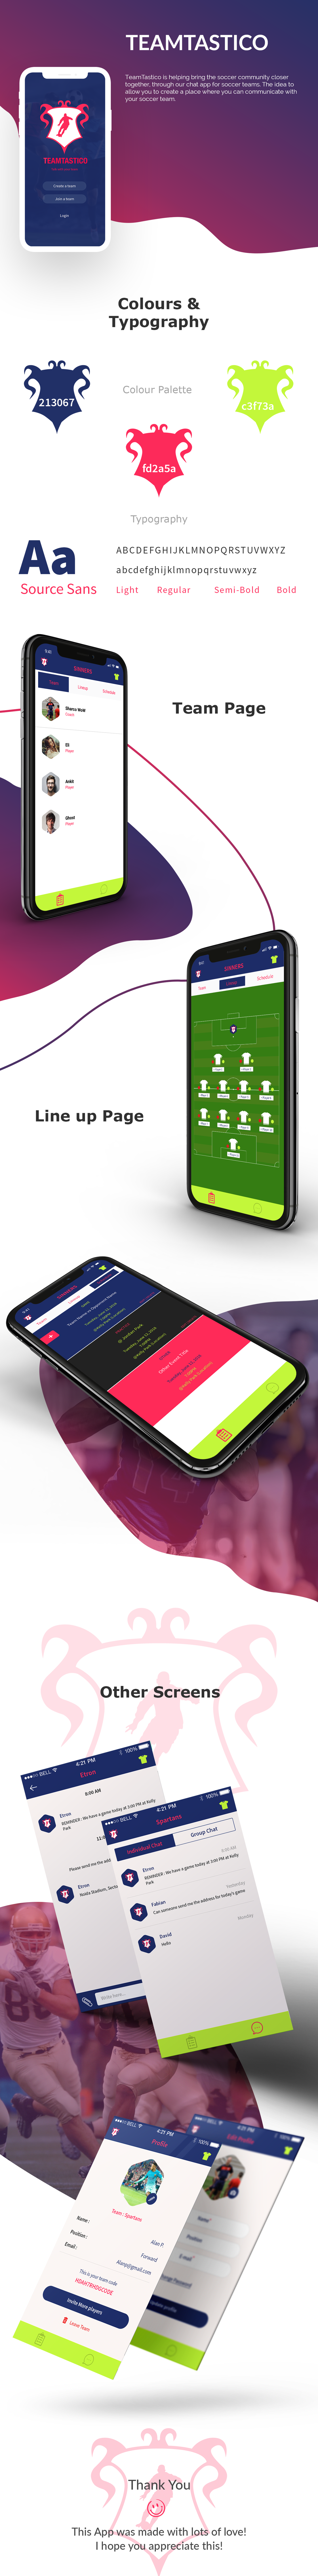 top mobile app mobile app developers soccer app mobile developement mobile app development ui design Android App Development Google Play